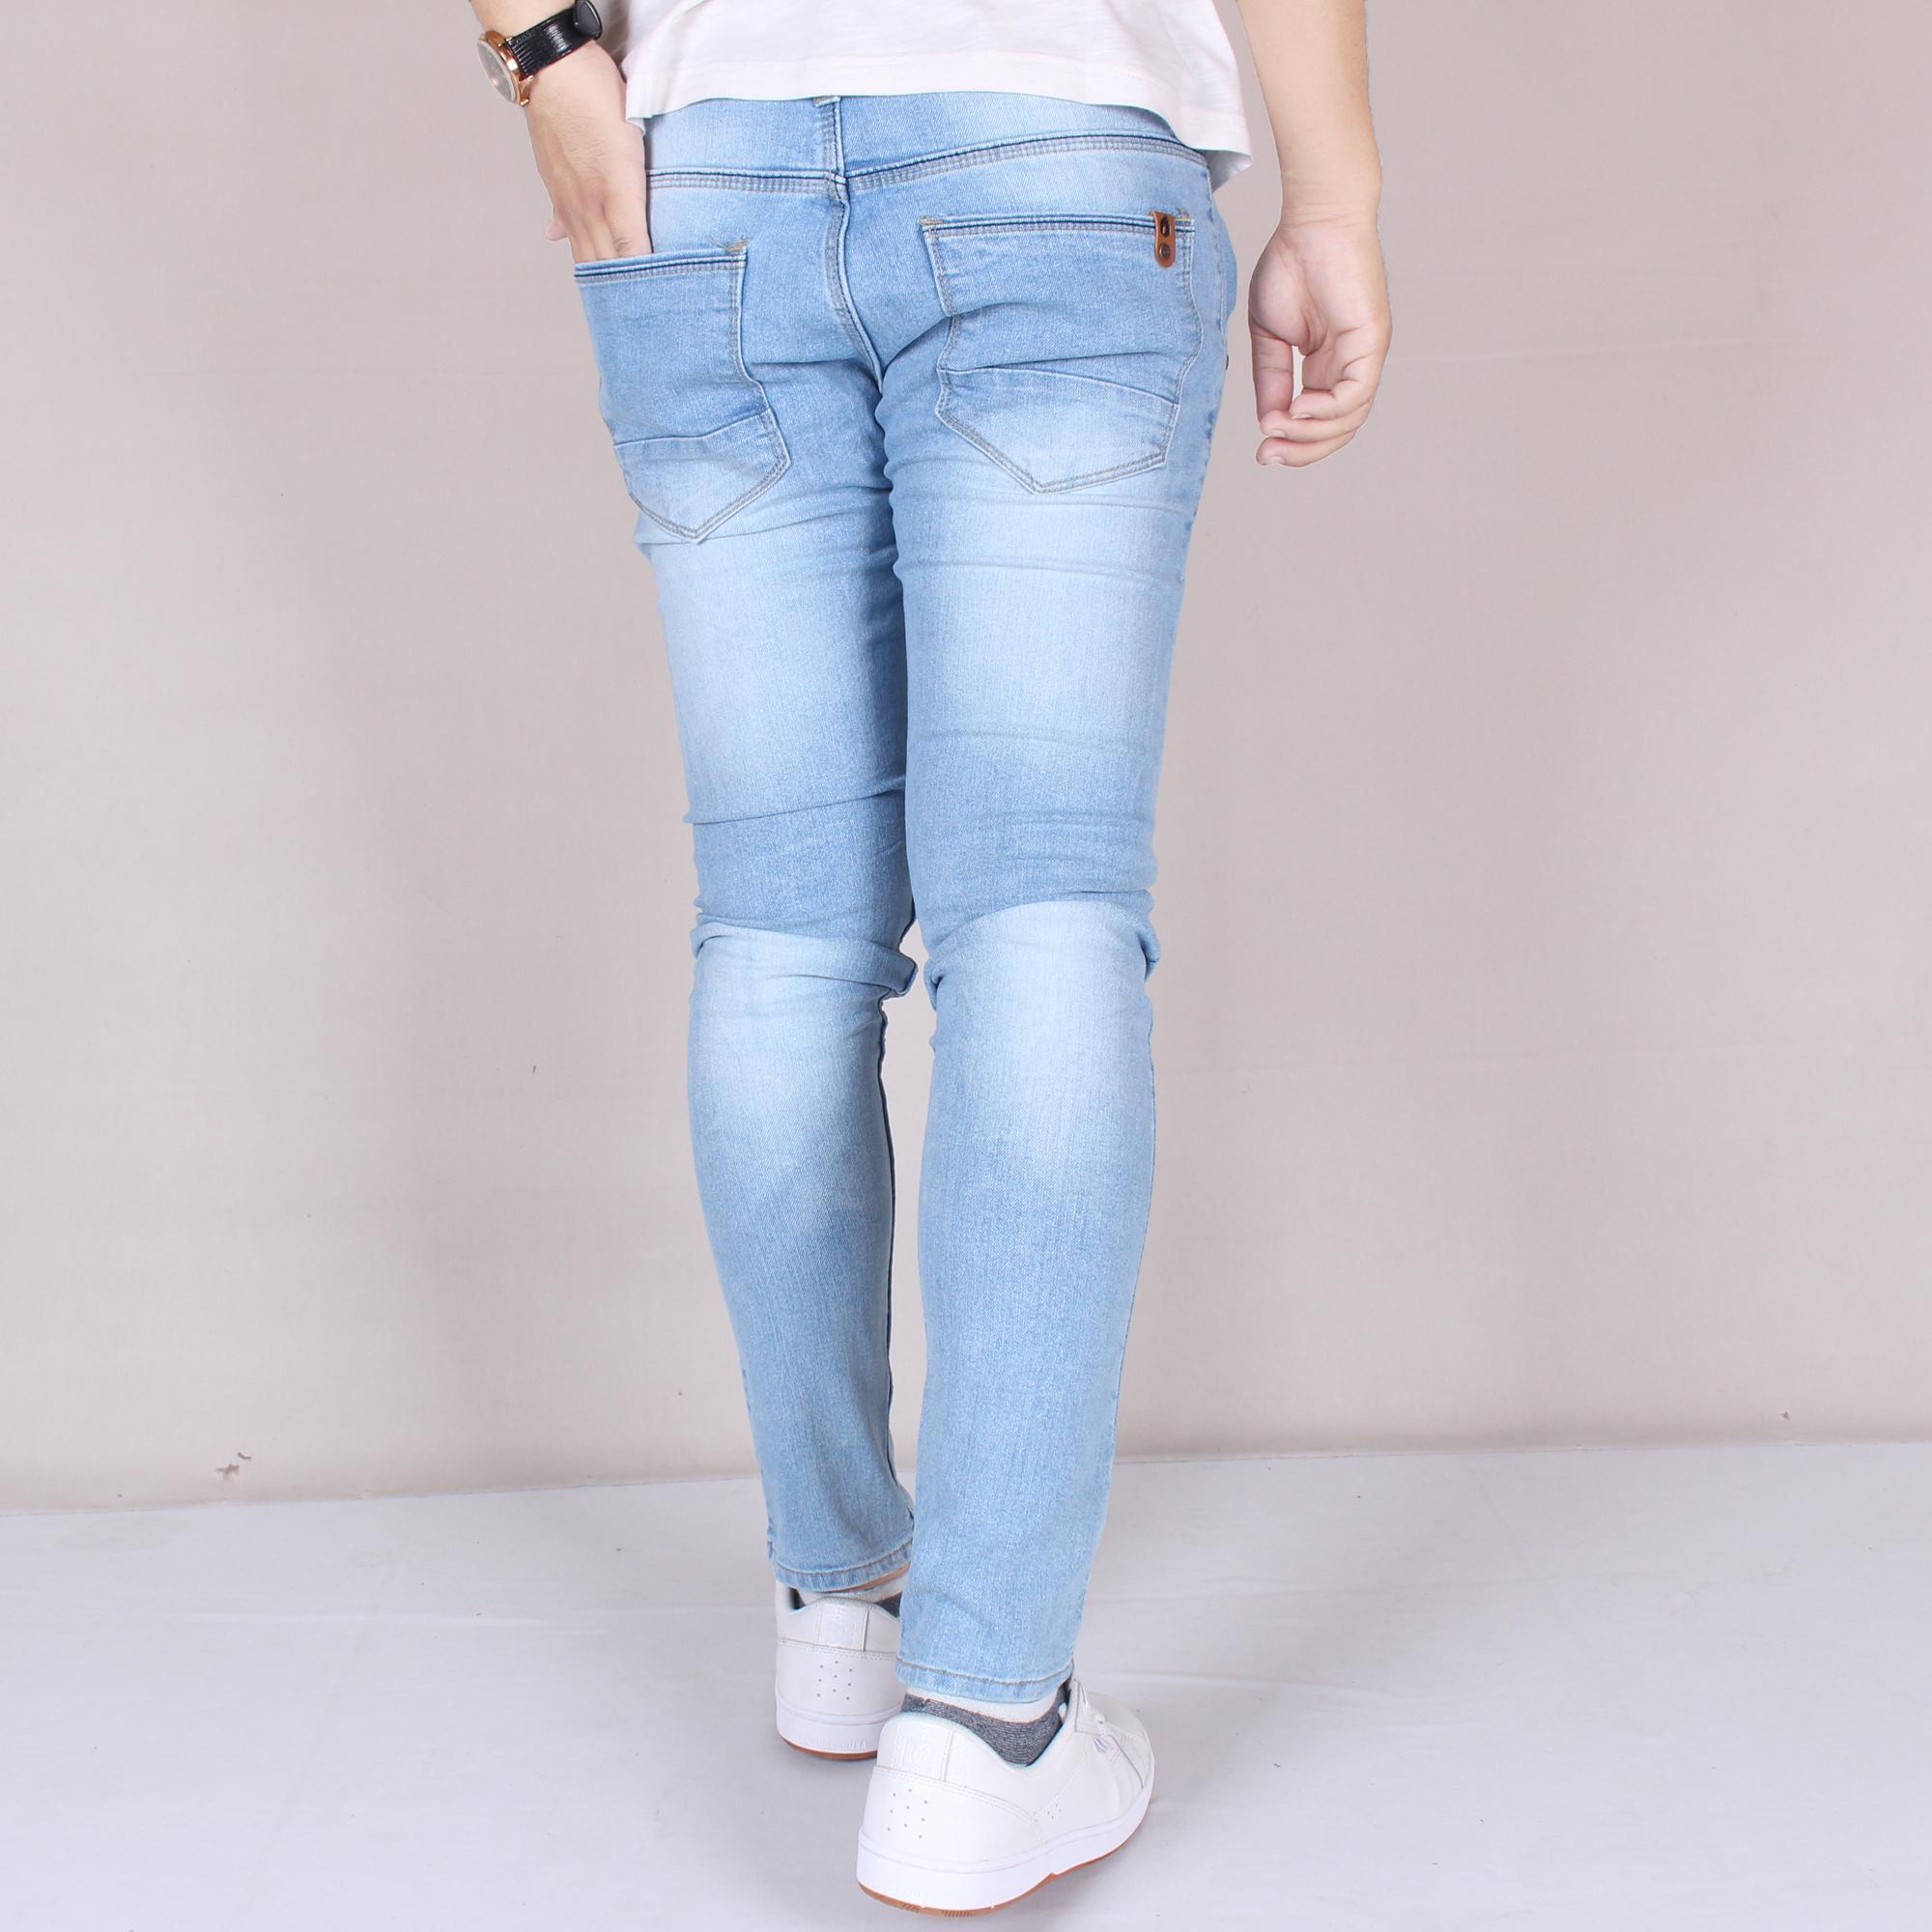 Detail Gambar Zs-fashion 6008 Celena Jeans Panjang Pria Celana Jeans Skinny Cowok Skinny Jeans Blue Sky Simple Celana Jeans Slimfit Denim STRETCH Terkini